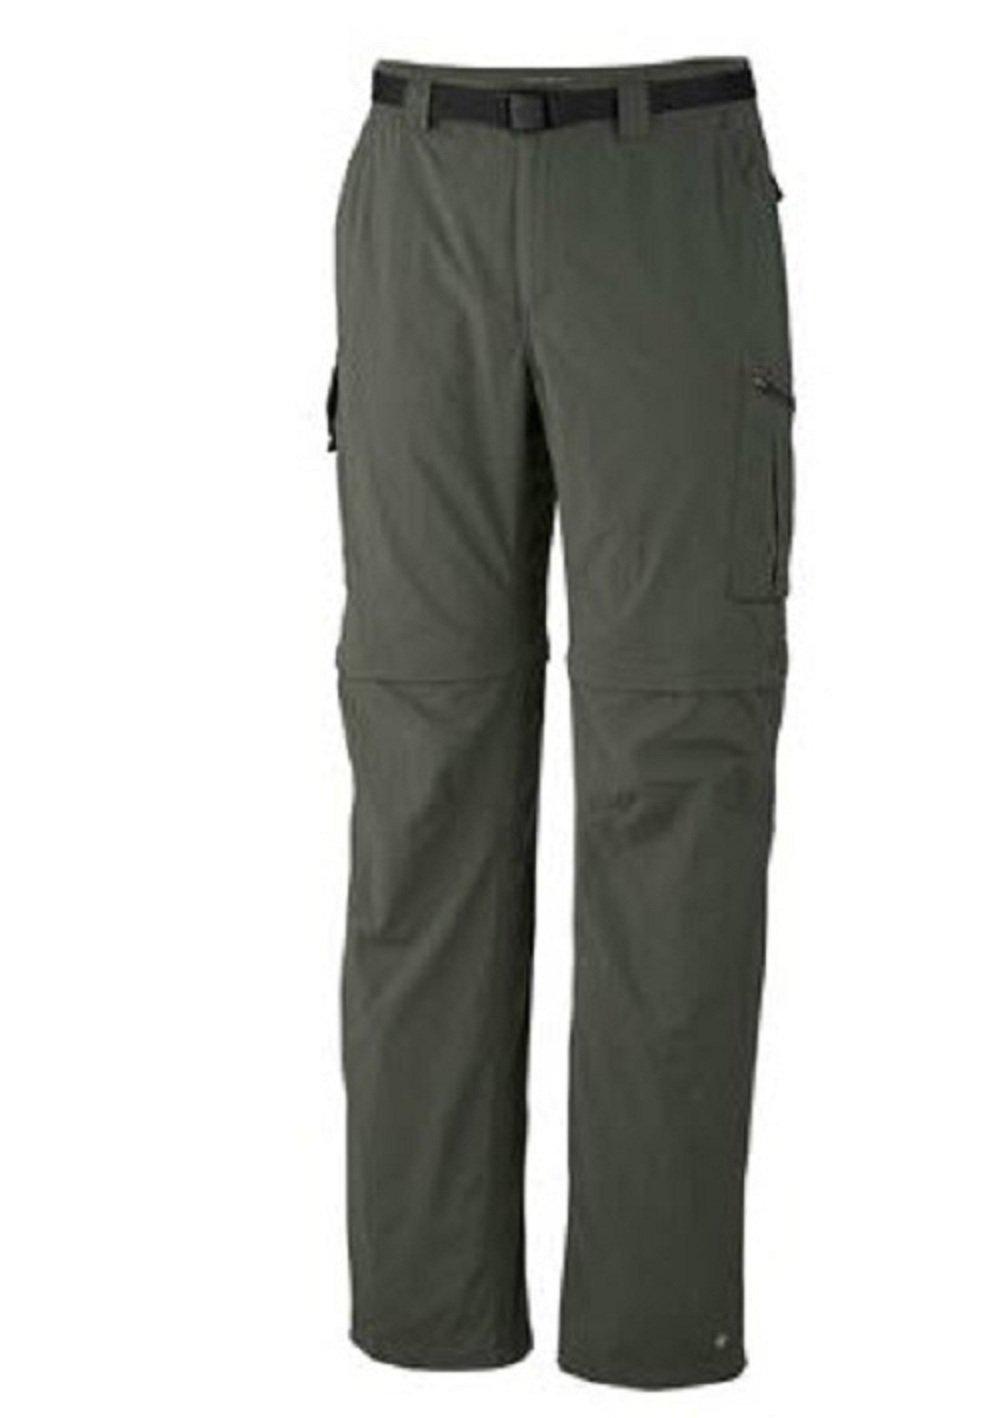 Columbia/哥伦比亚 男士运动裤Silver Ridge Convertible Pant一站式海淘,海淘花专业海外代购网站--进口 海淘 正品 转运 价格